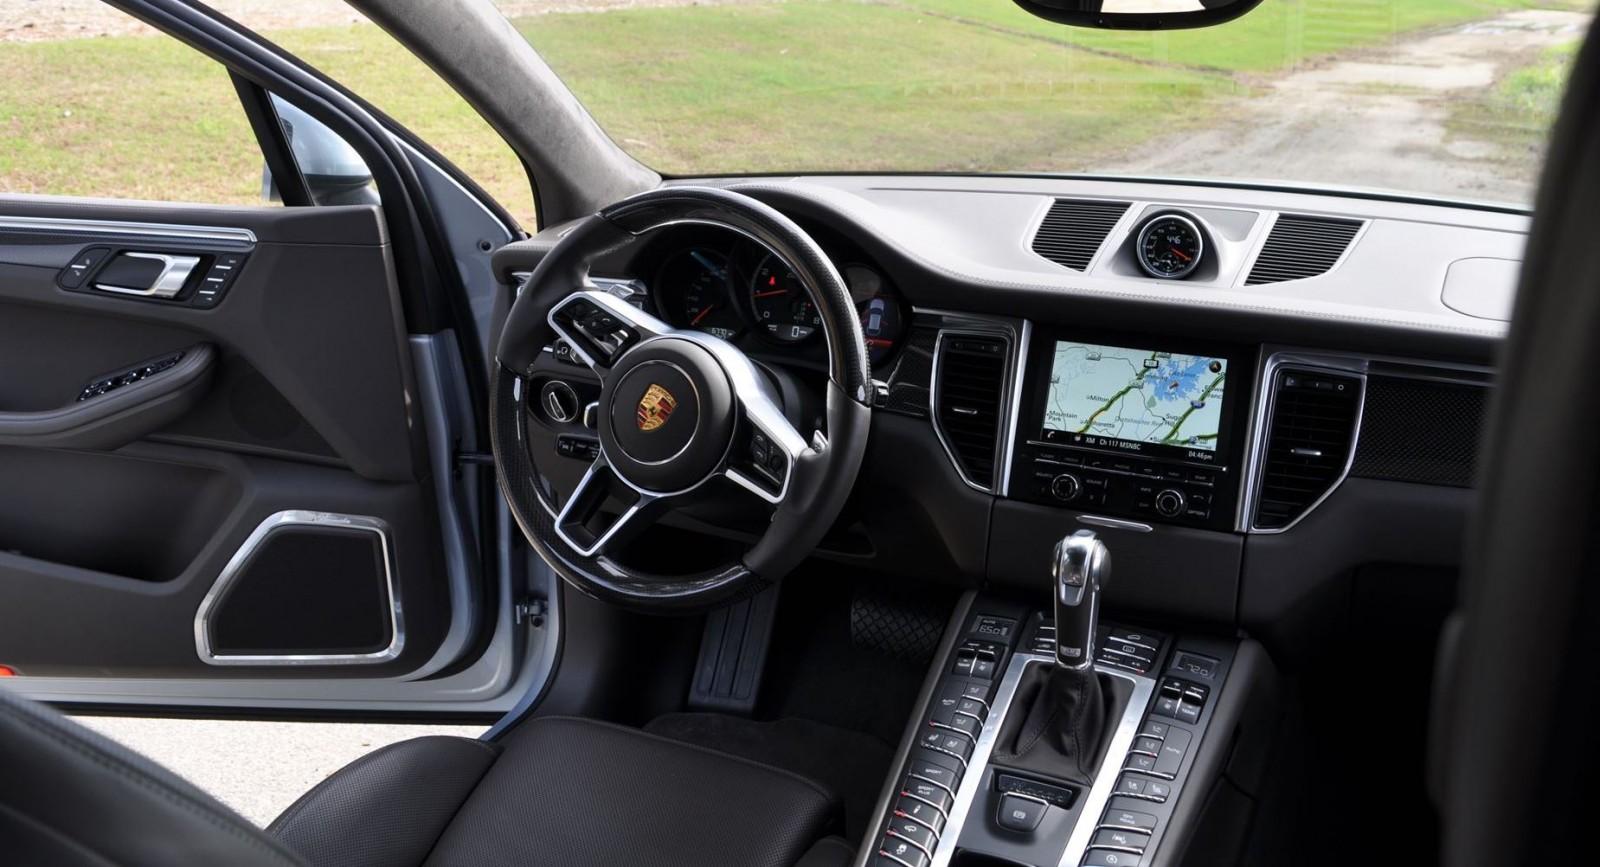 2015 Porsche Macan Turbo Review